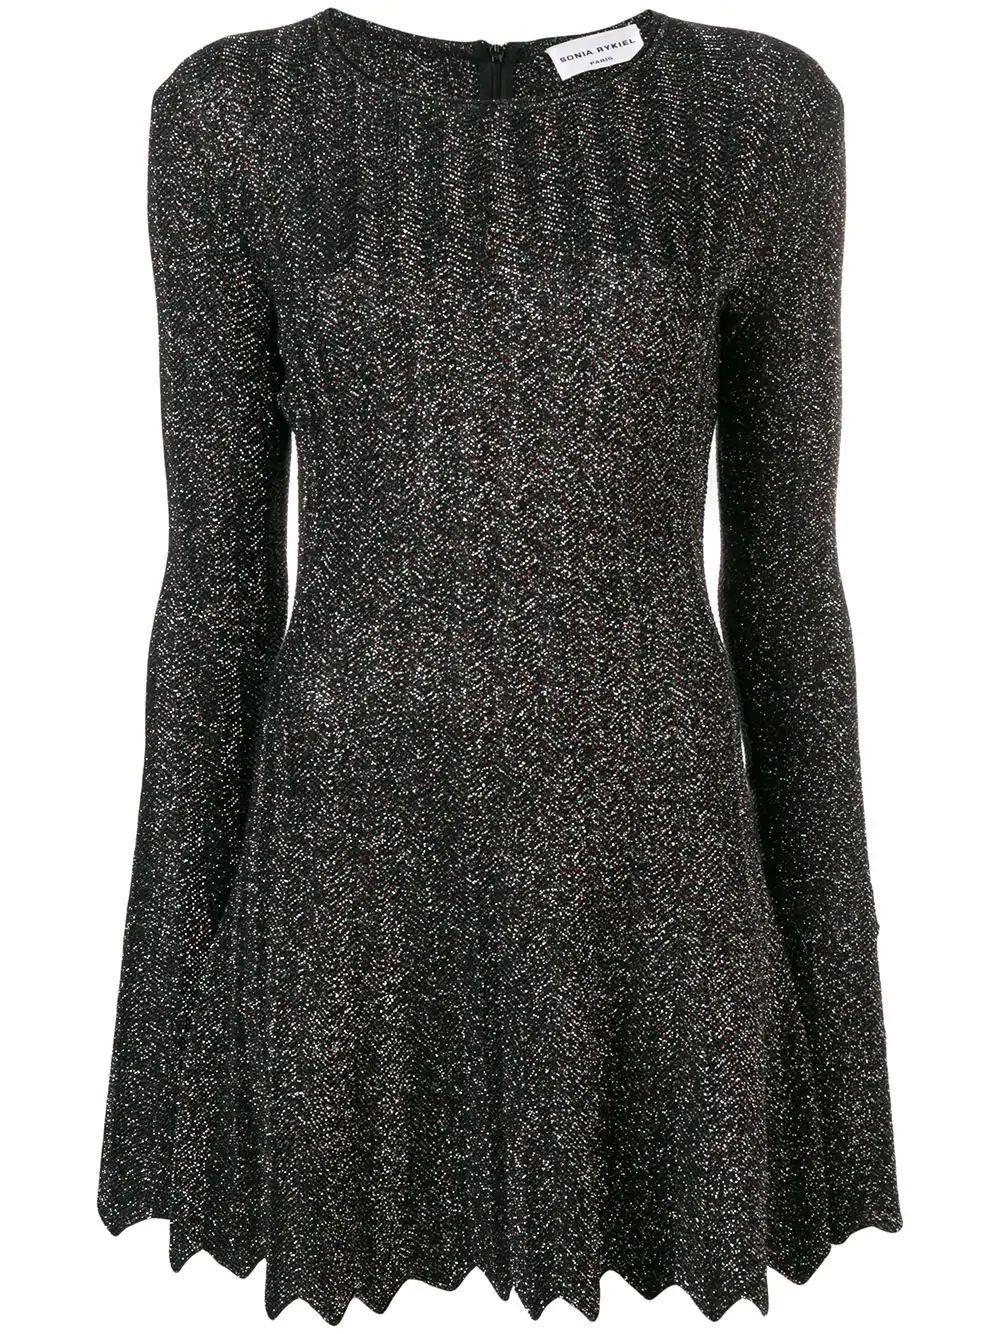 Long Sleeve Lurex Mini Dress Item # 13397413-IA